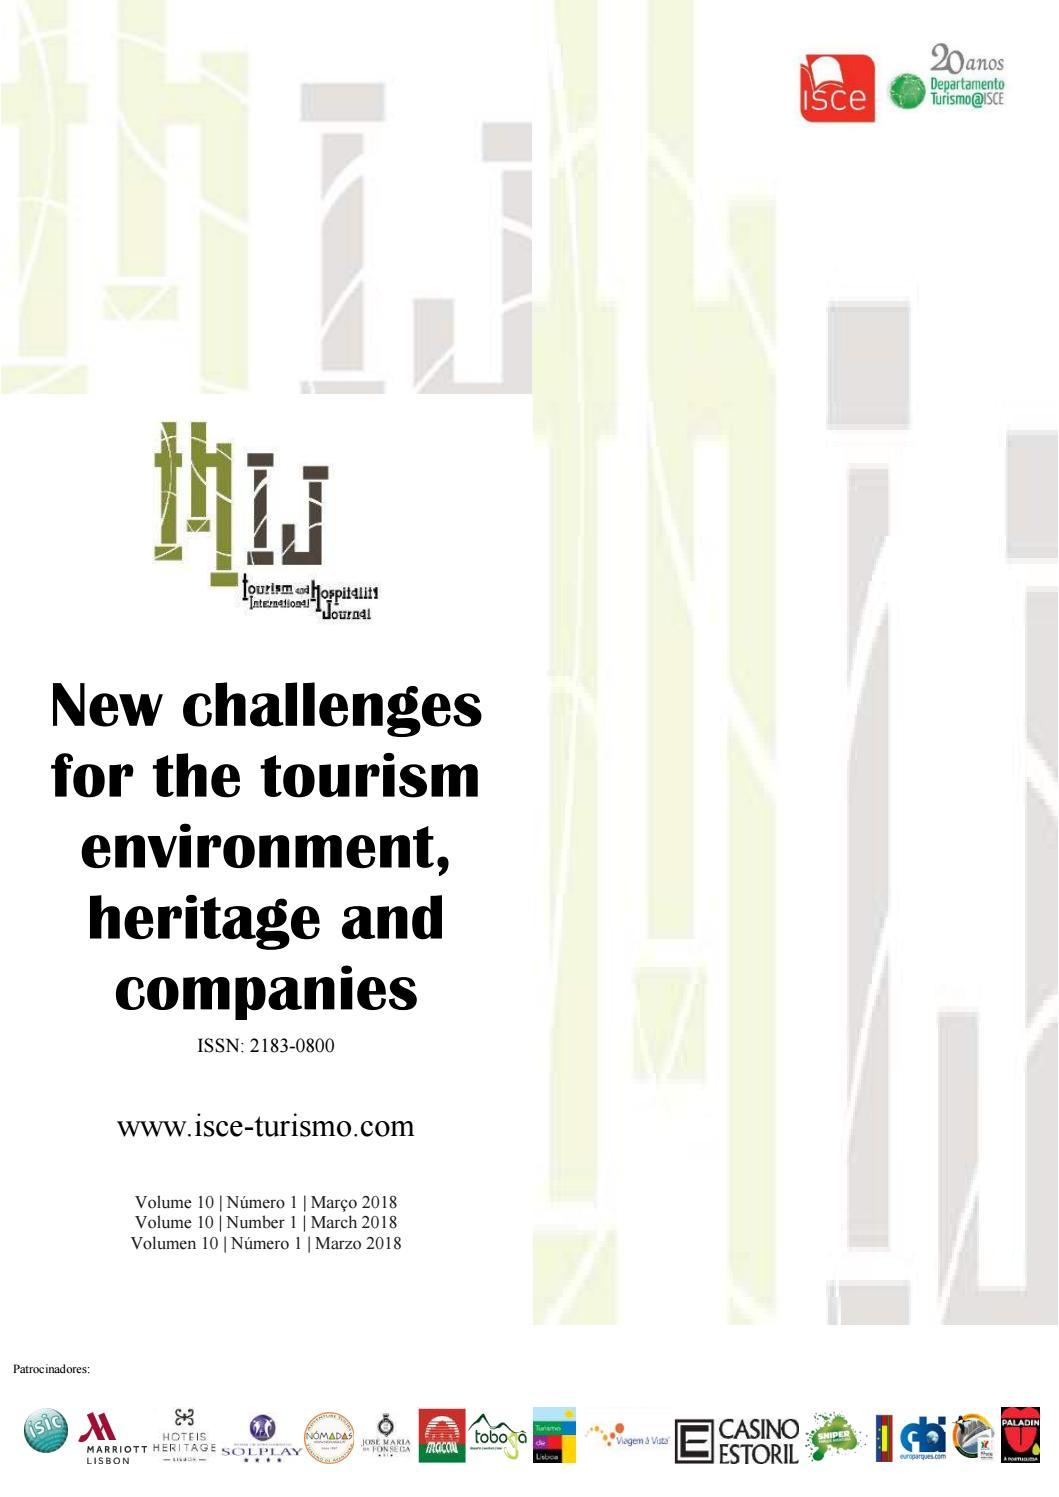 f210947c57 Thij full journal 10(1) pdf by TurismoISCE - issuu